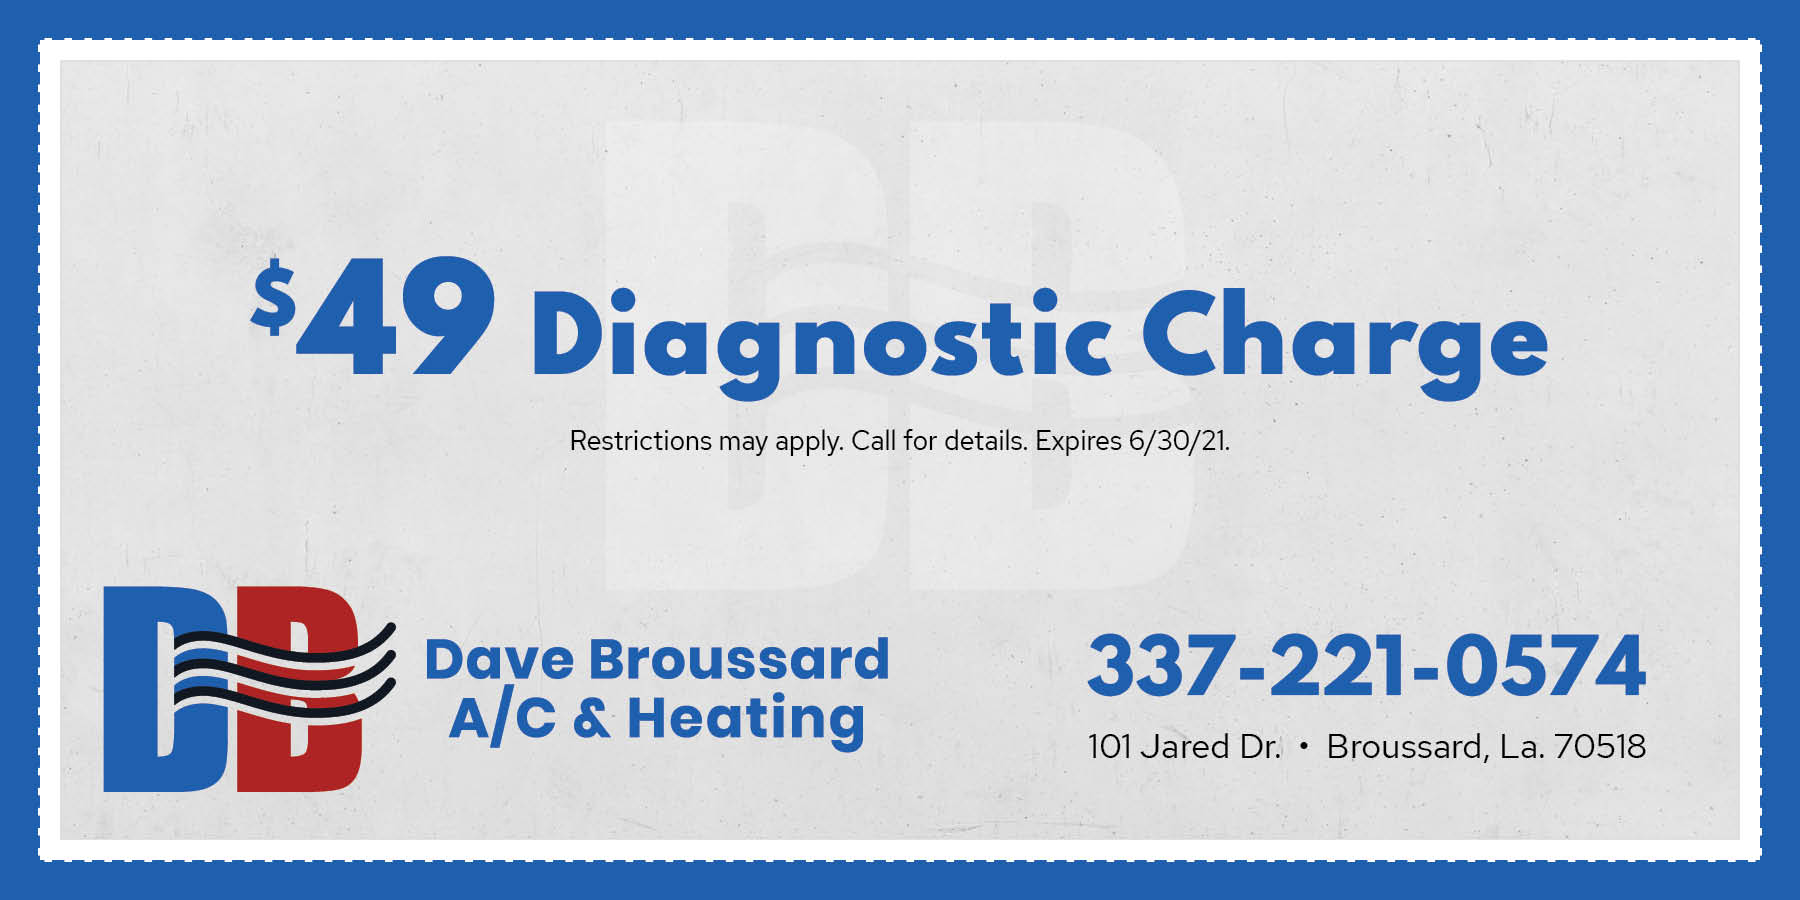 DAV-diagnostic-Coupon